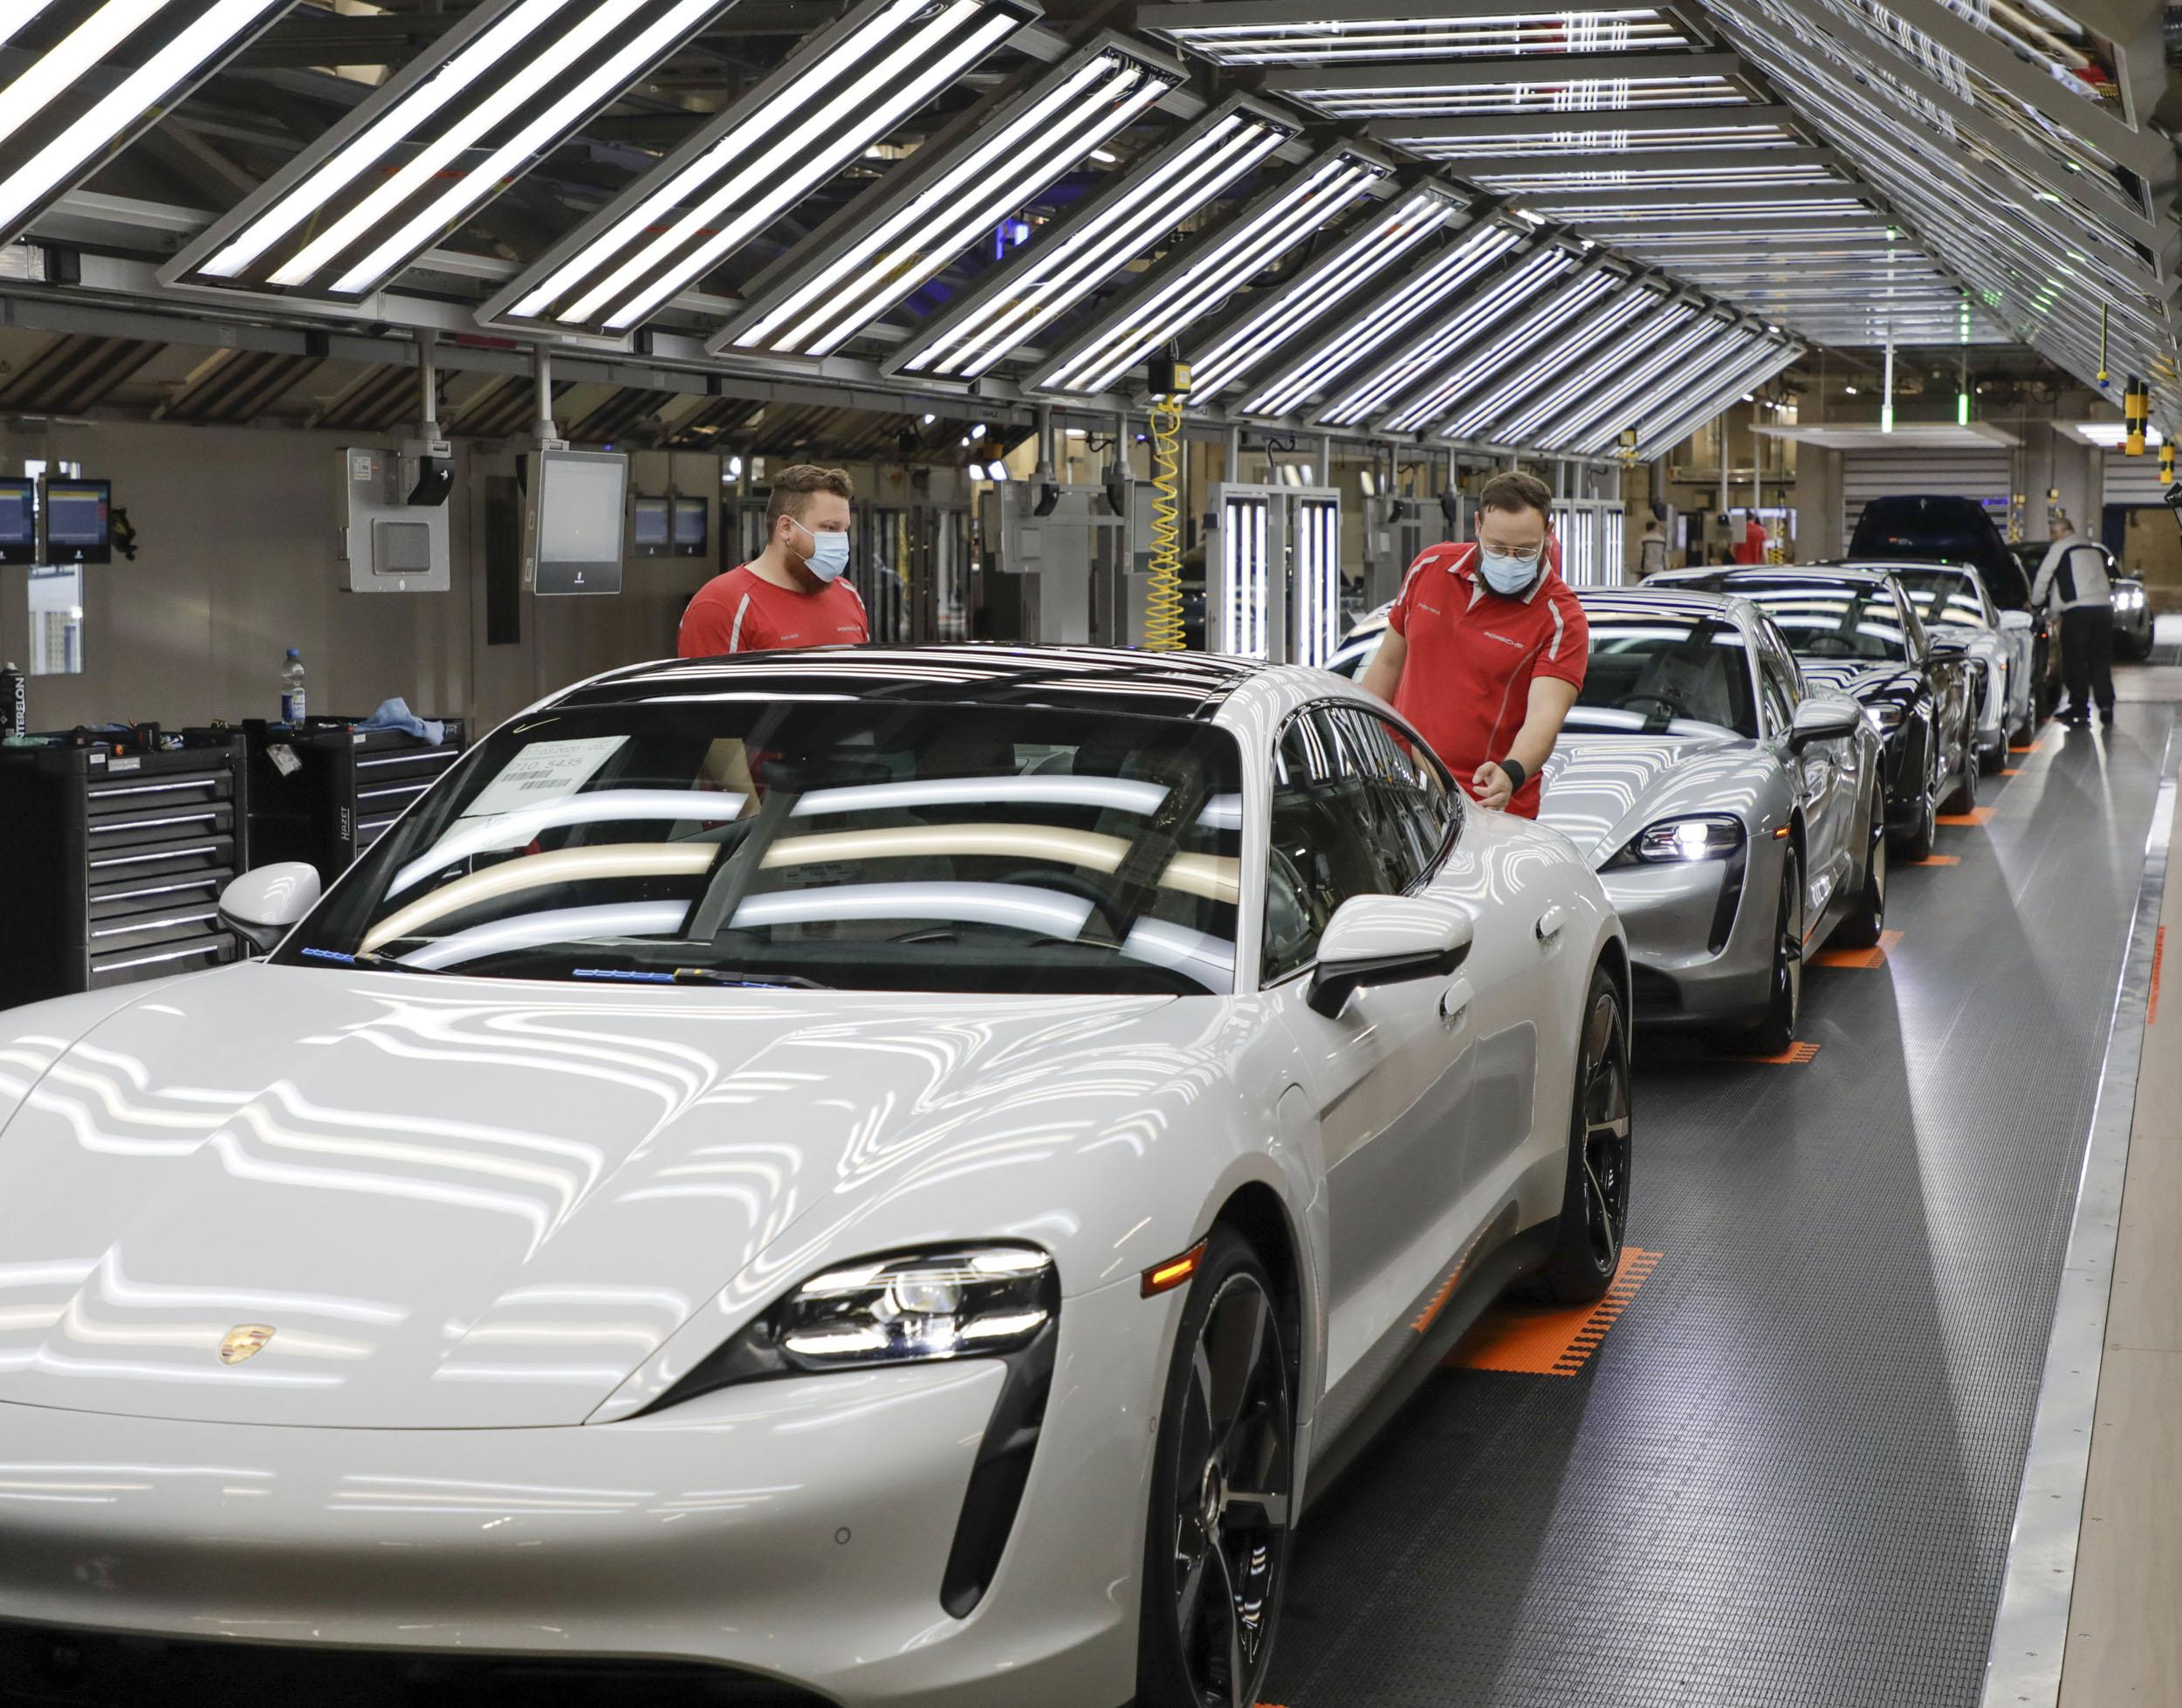 200429 Porsche is manufacturing sports cars again (1)